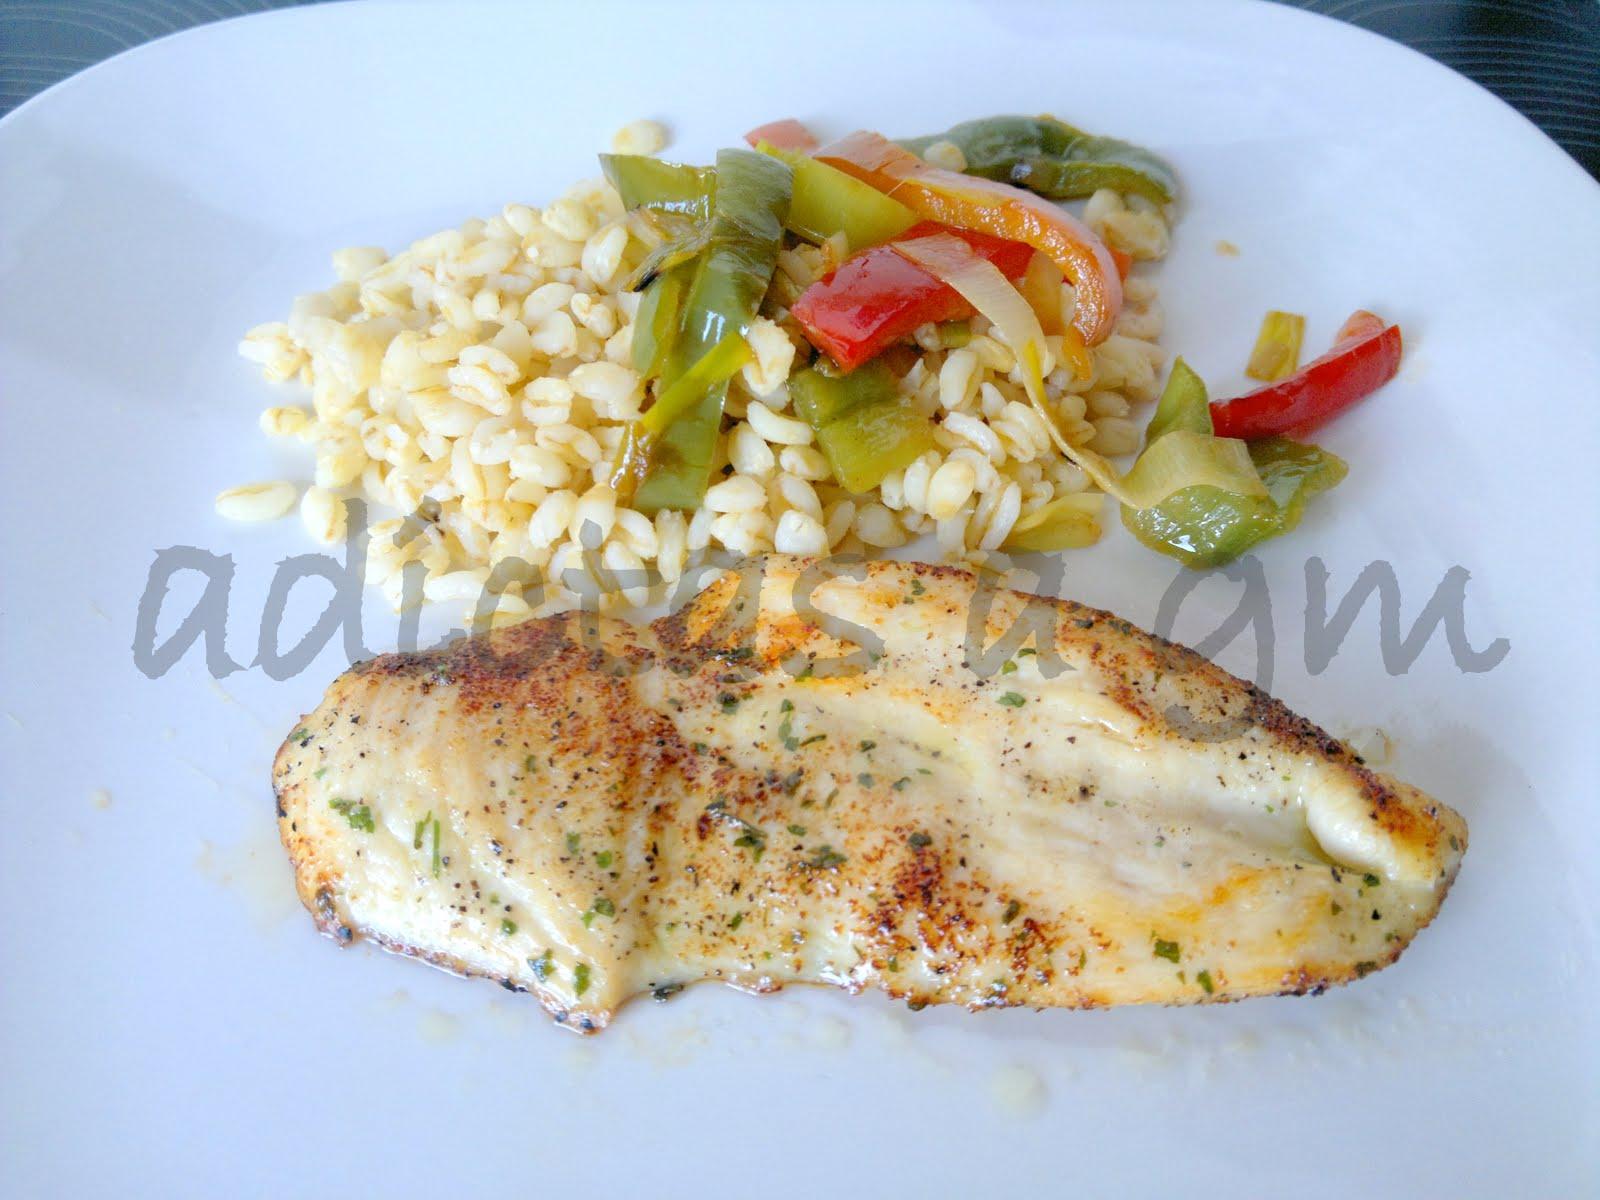 Trigo Con verduras y pechuga de pollo